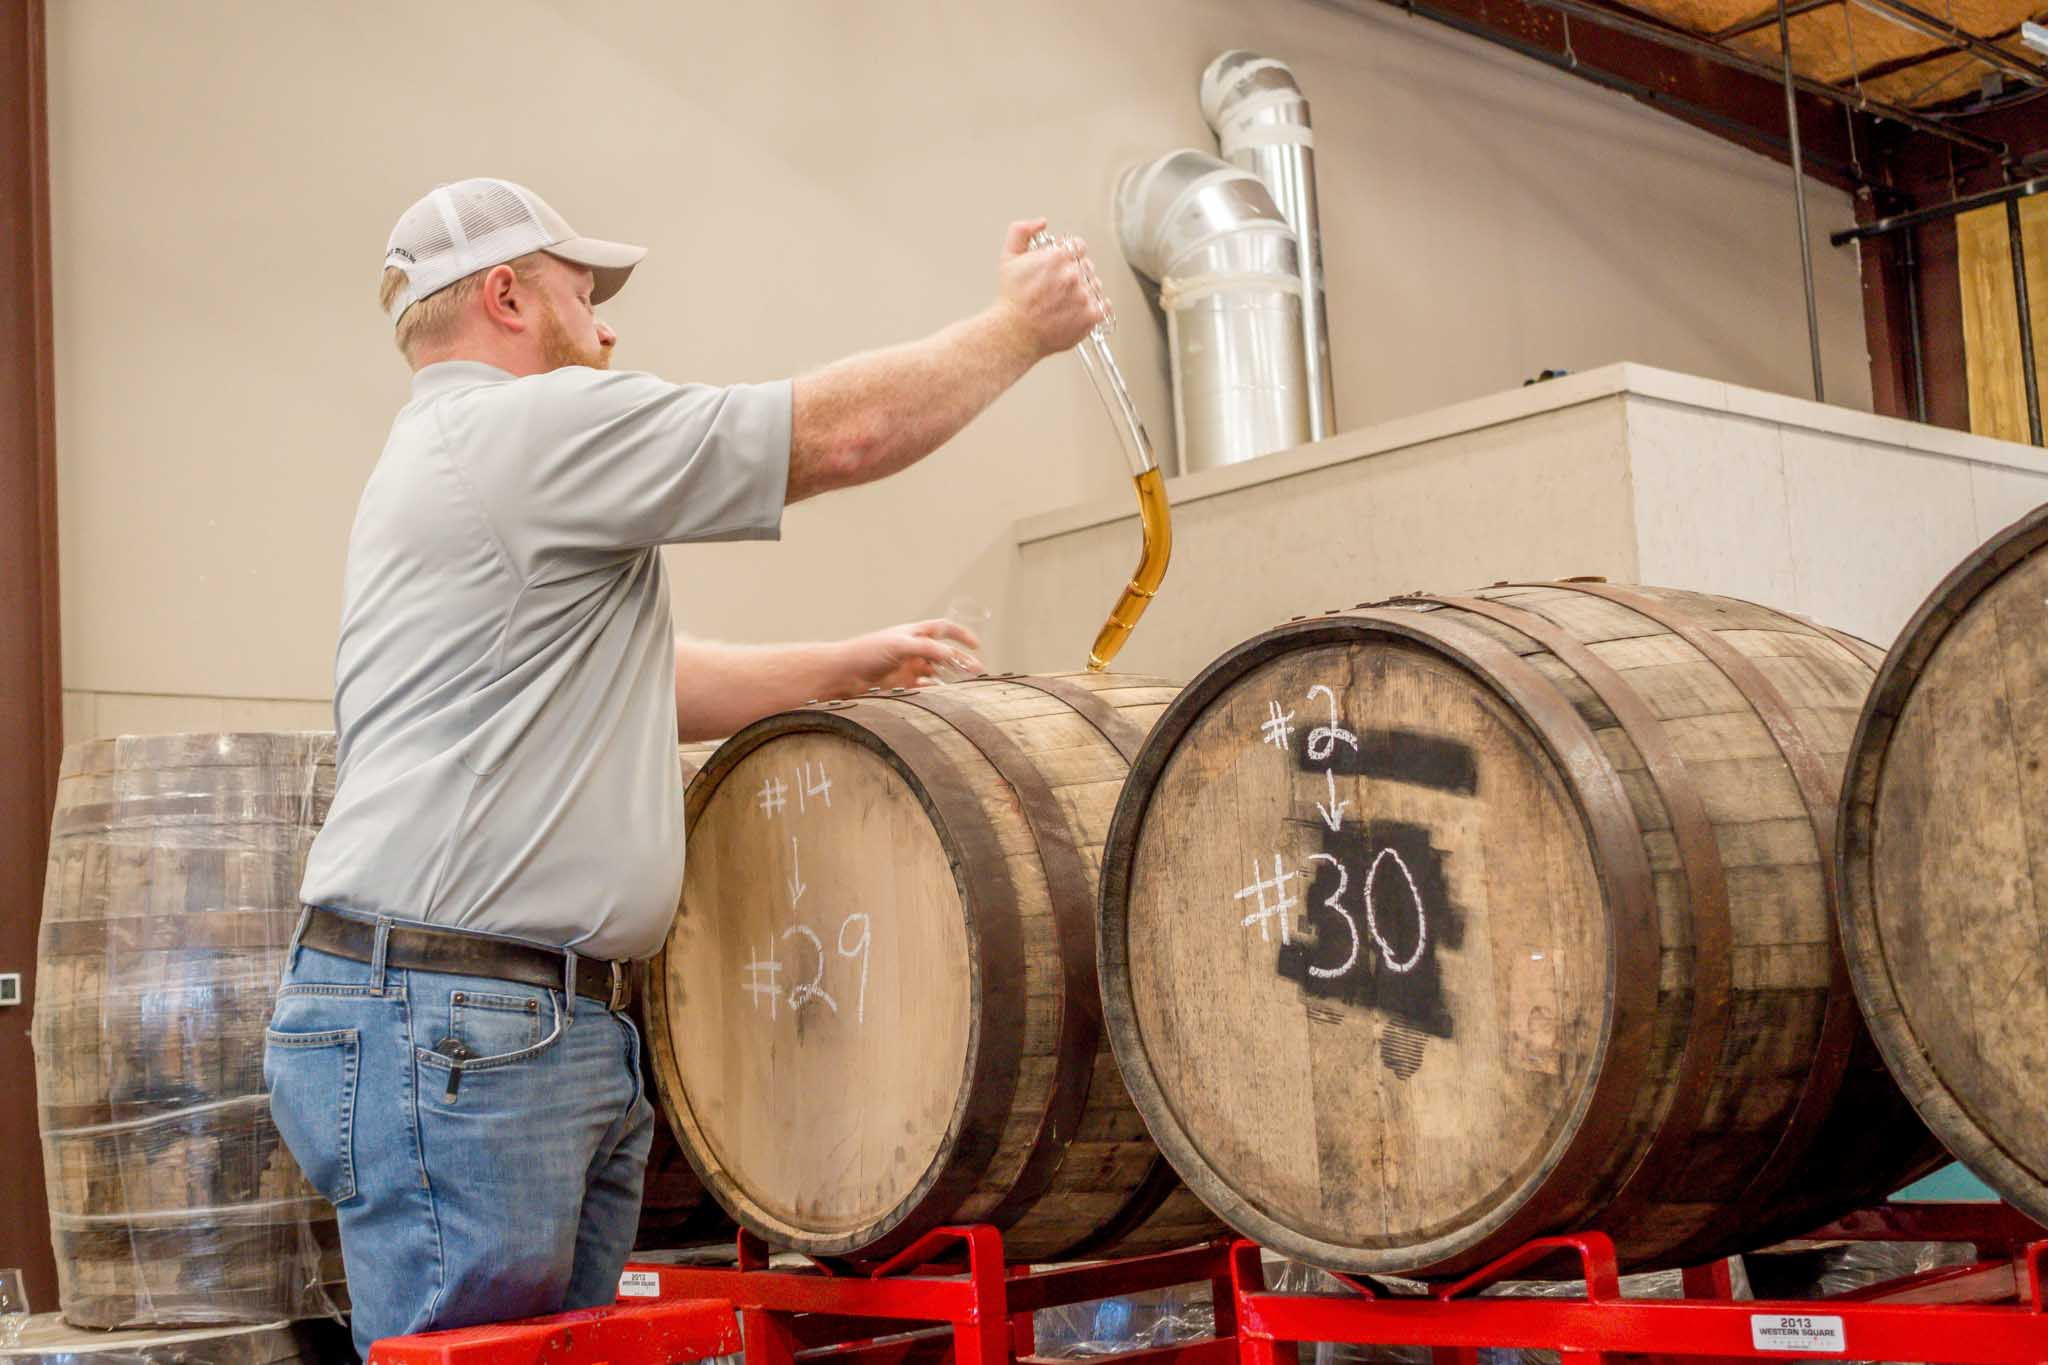 Man opening barrel of whiskey